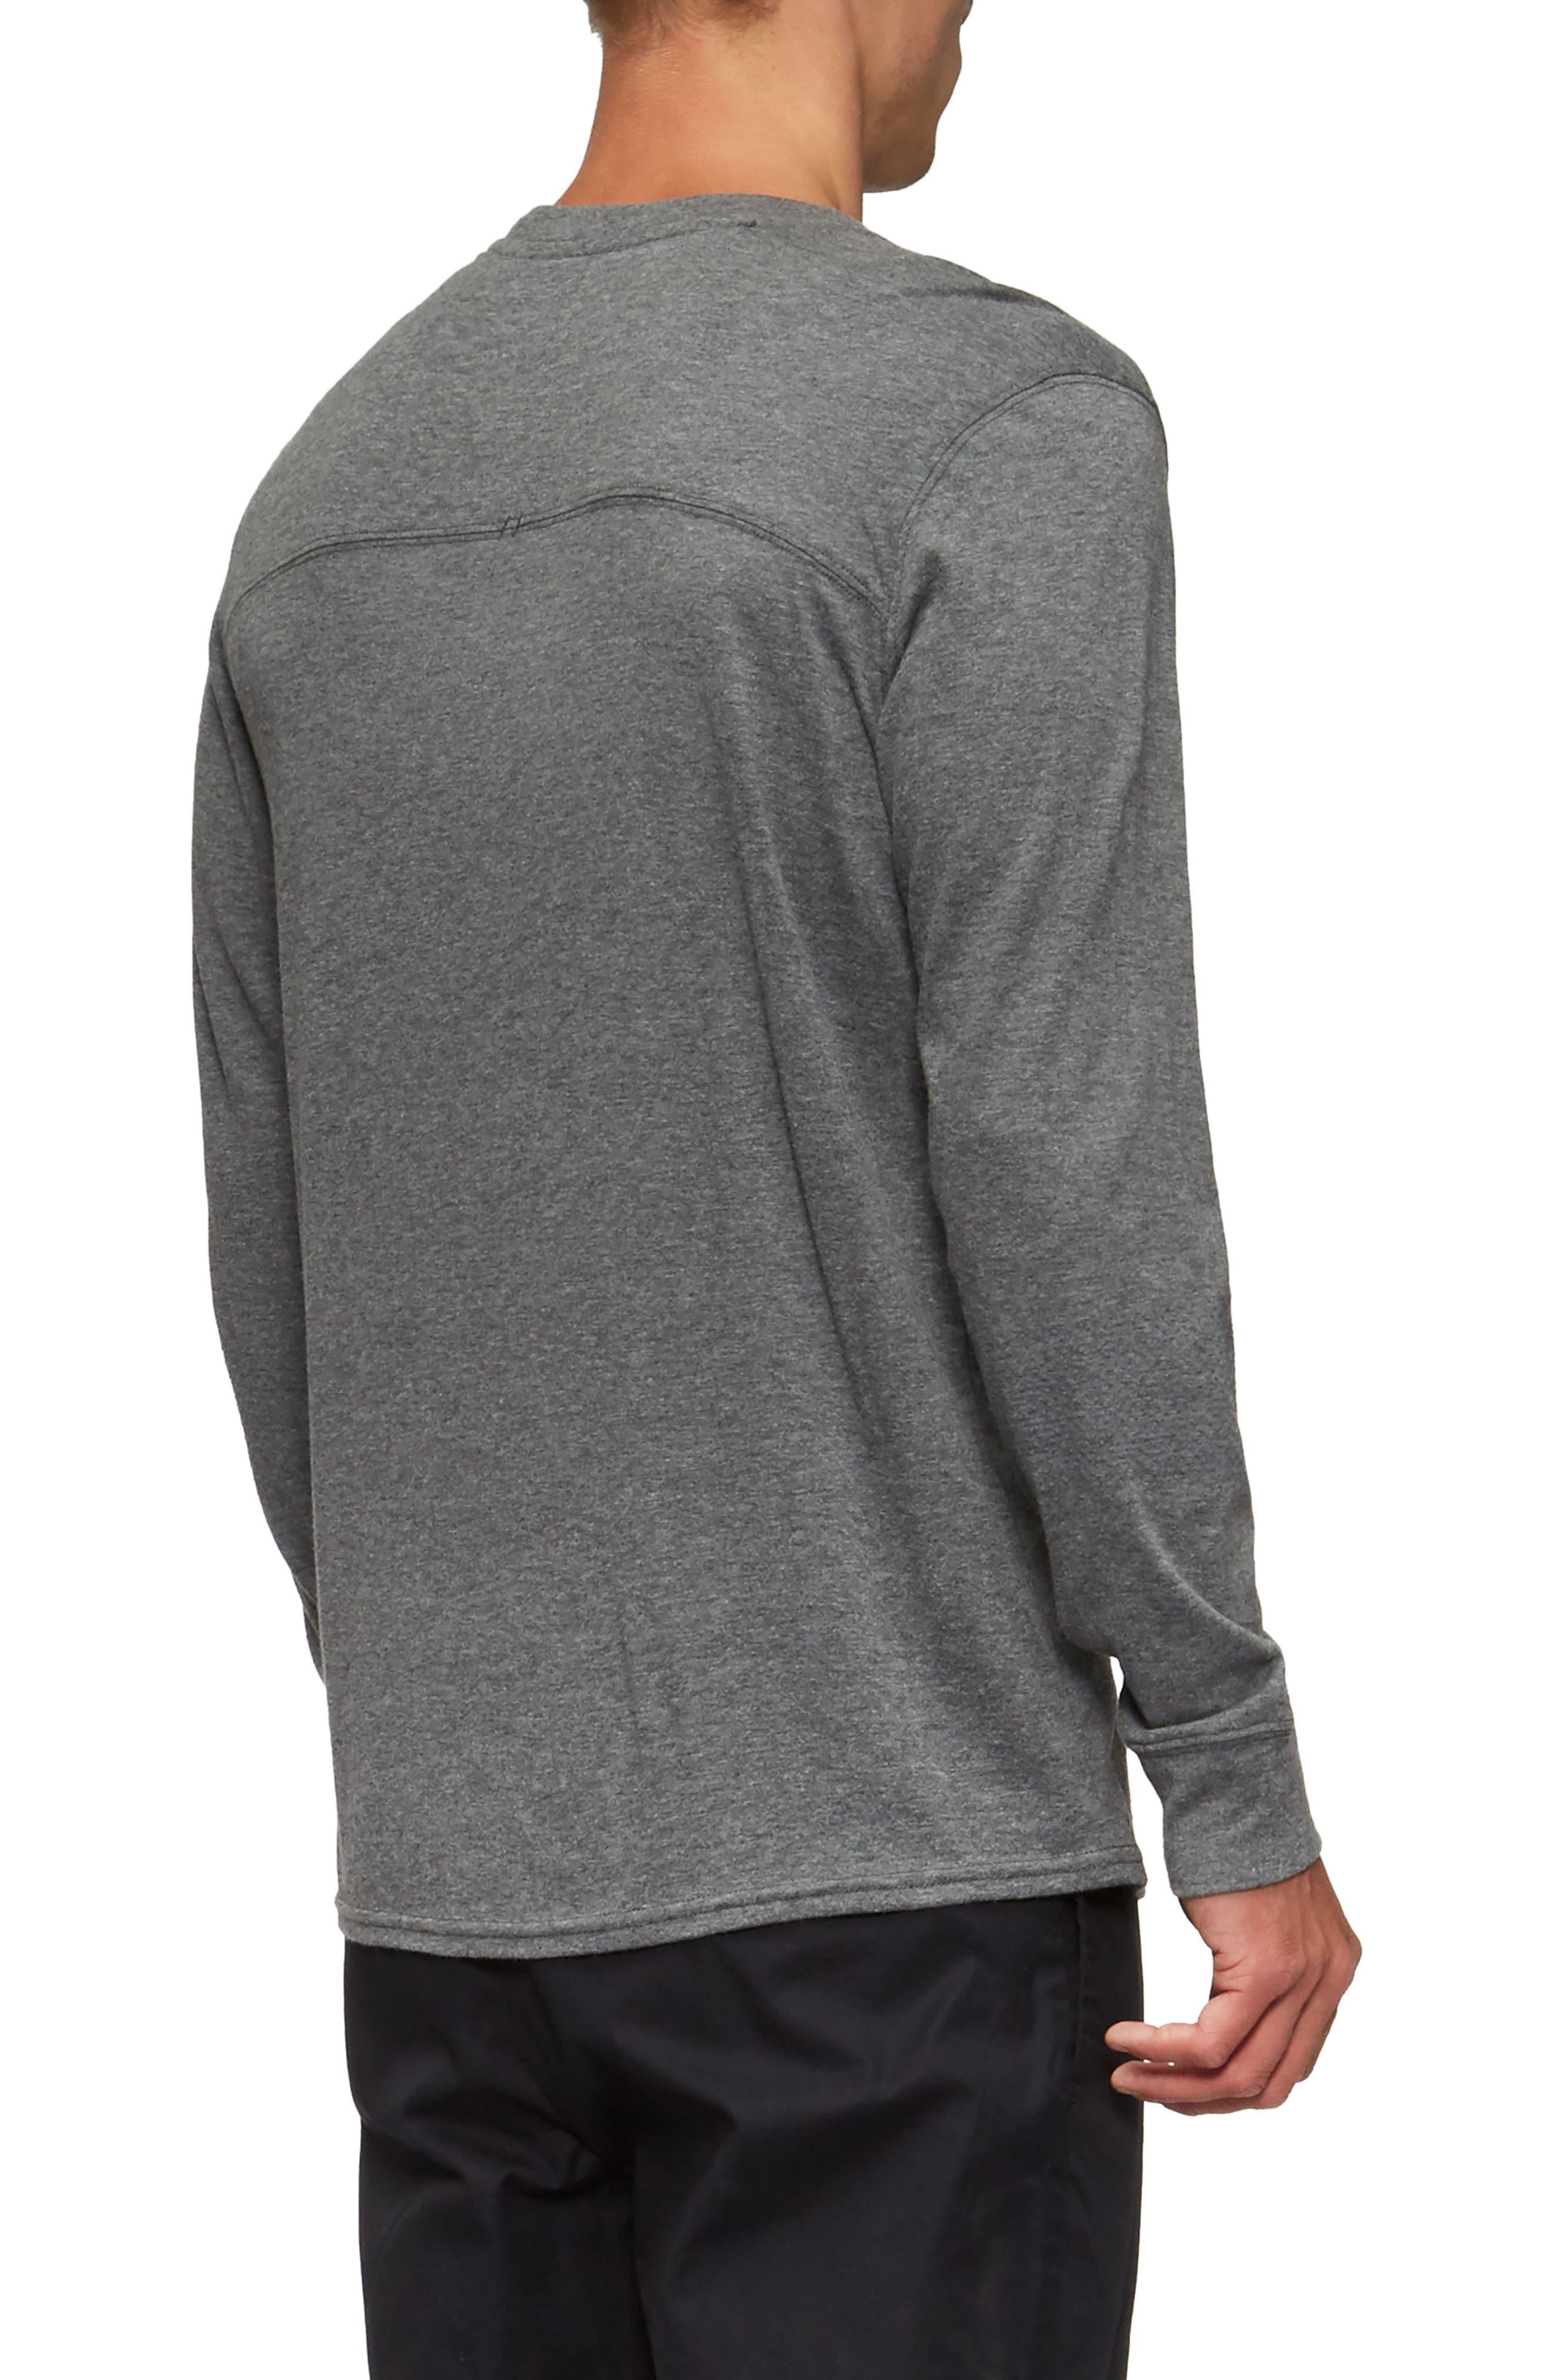 Lowell Long Sleeve T-Shirt,                             Alternate thumbnail 2, color,                             Heather Grey